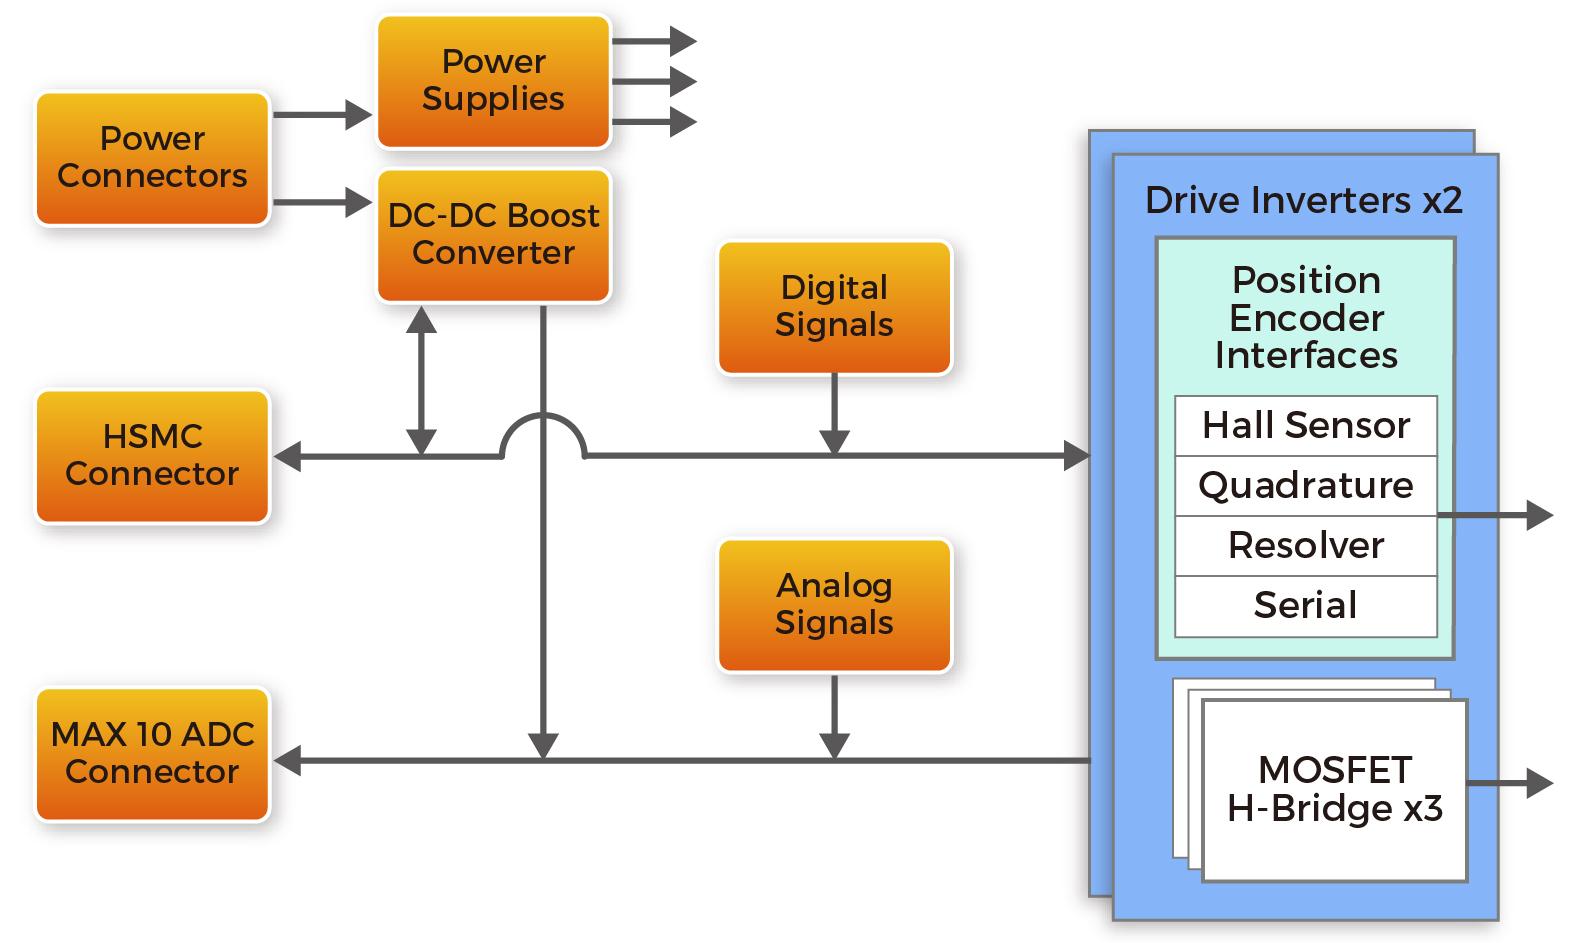 Terasic Daughter Cards Robotics Motors Tandem Motion Power 48v H Bridge Block Diagram 48 V Board Functional Description